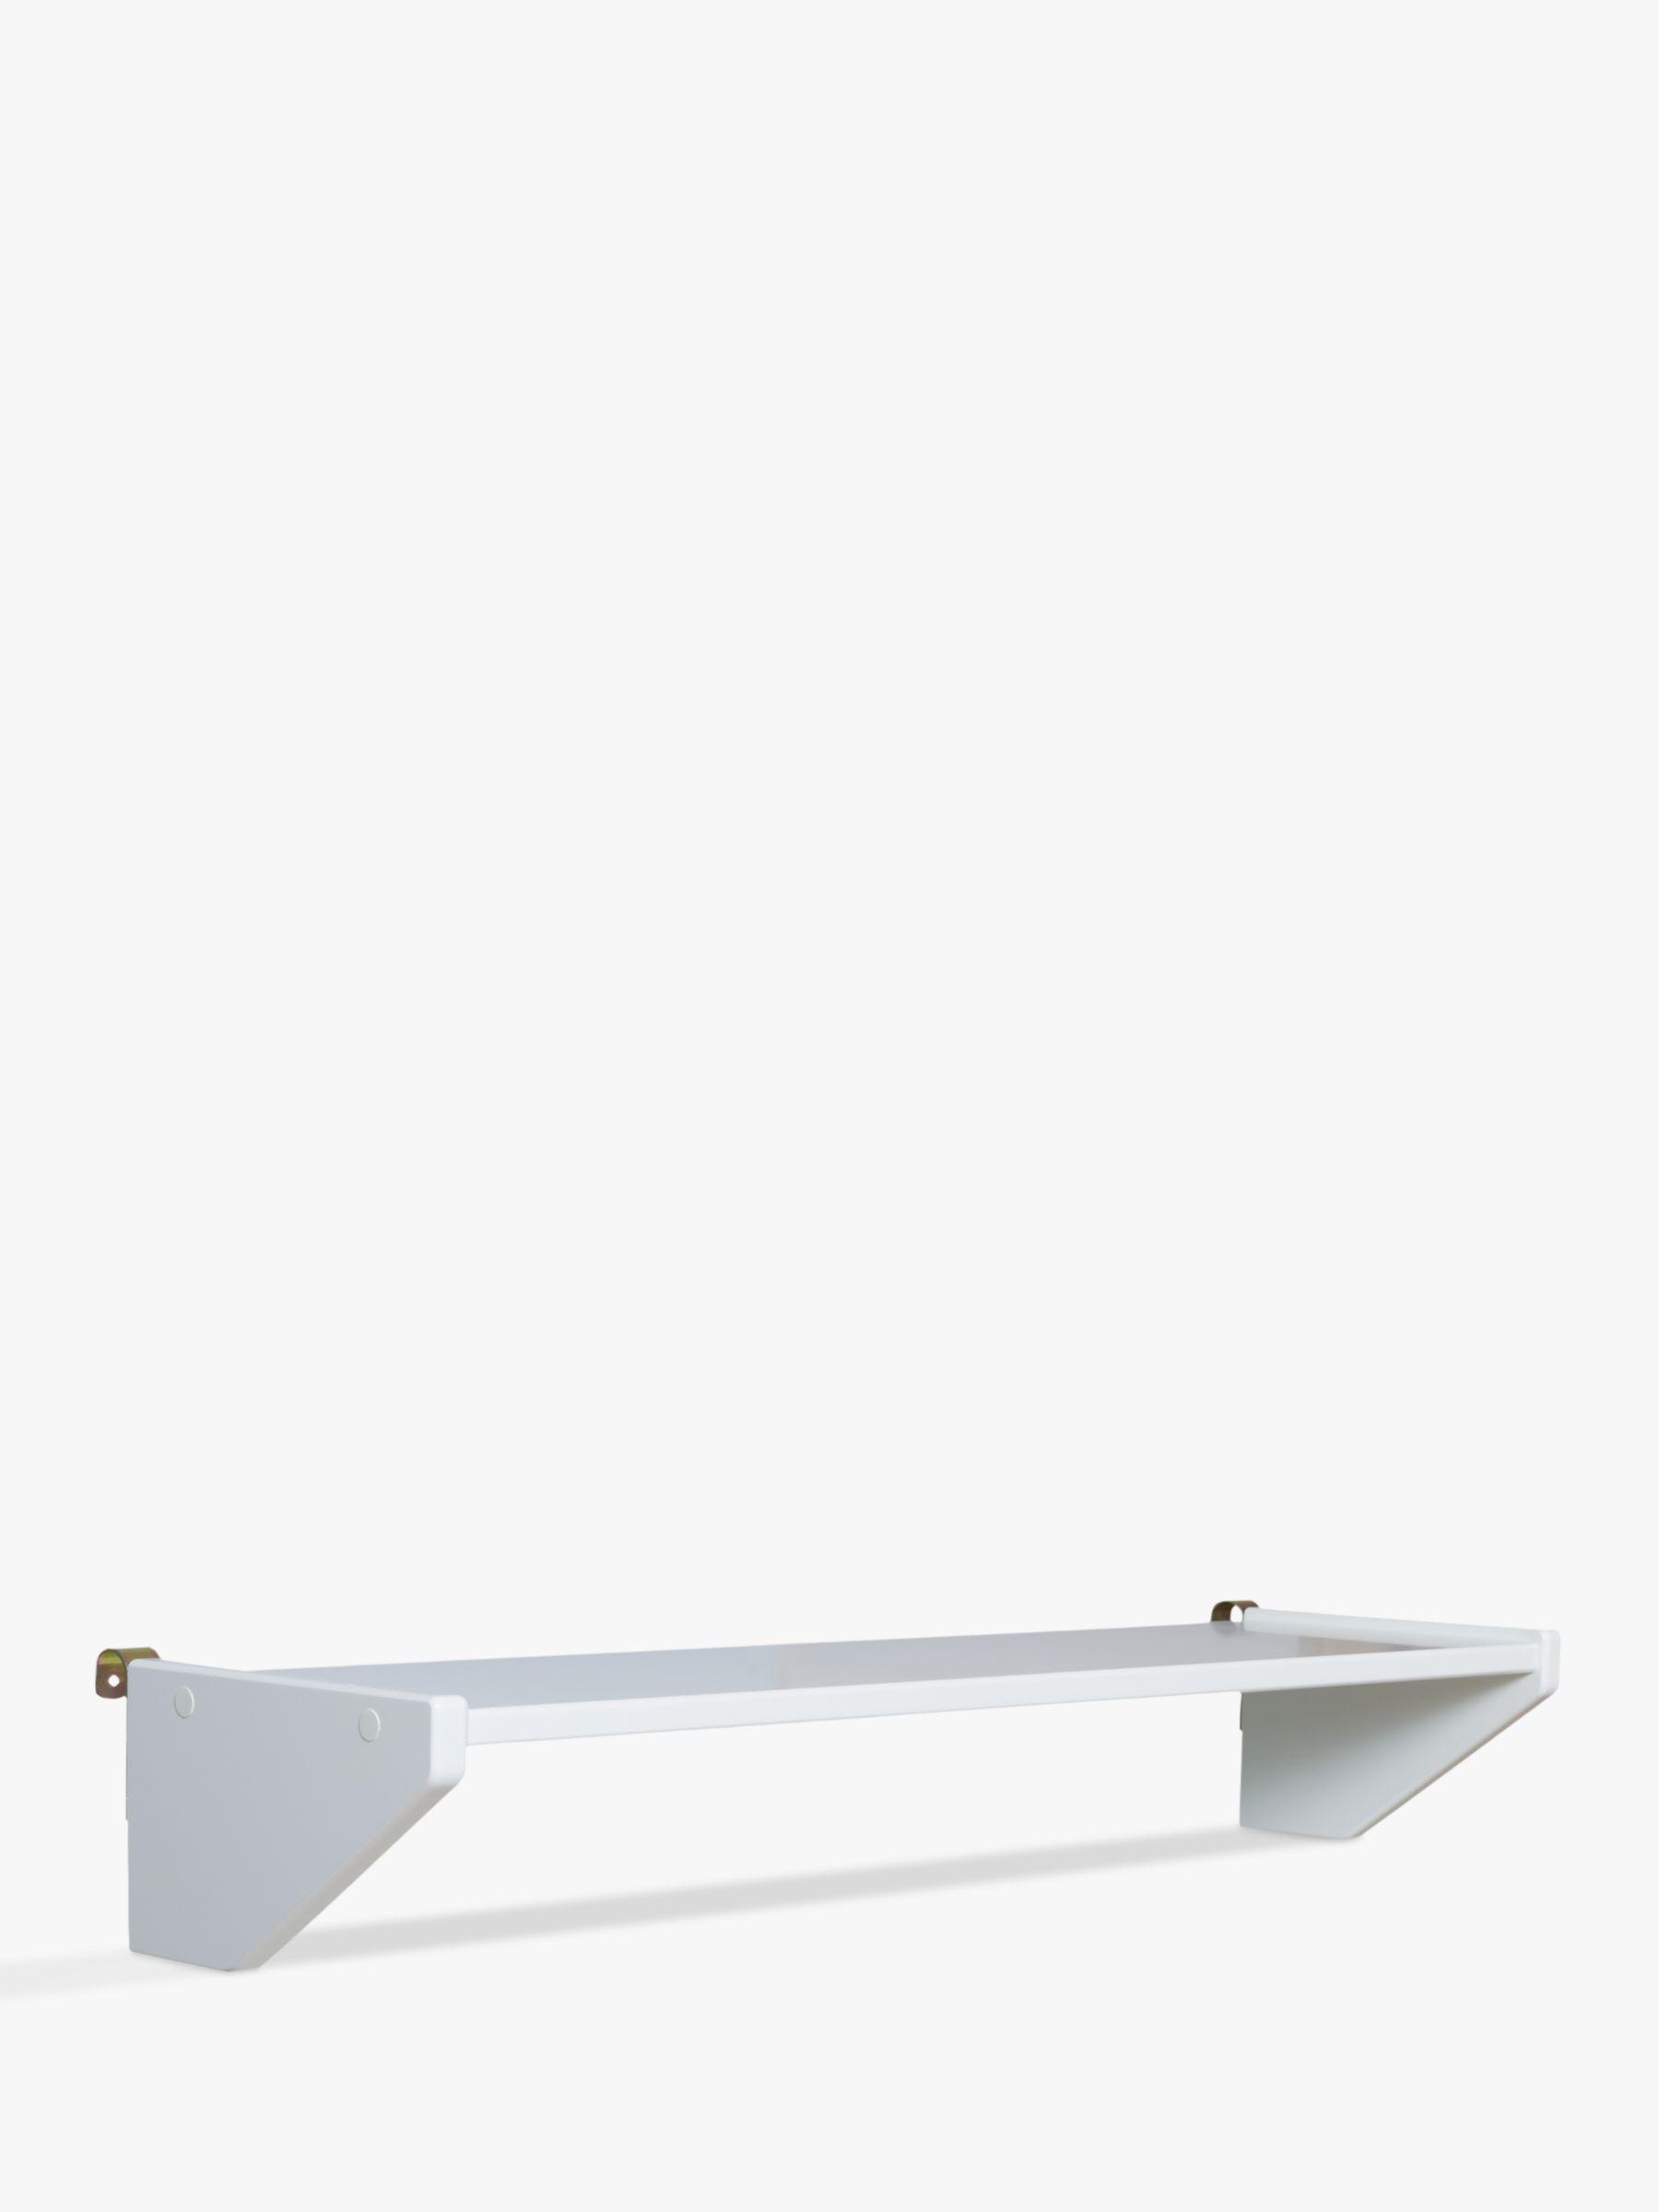 Stompa Stompa Uno S Plus Large Clip-On Shelf